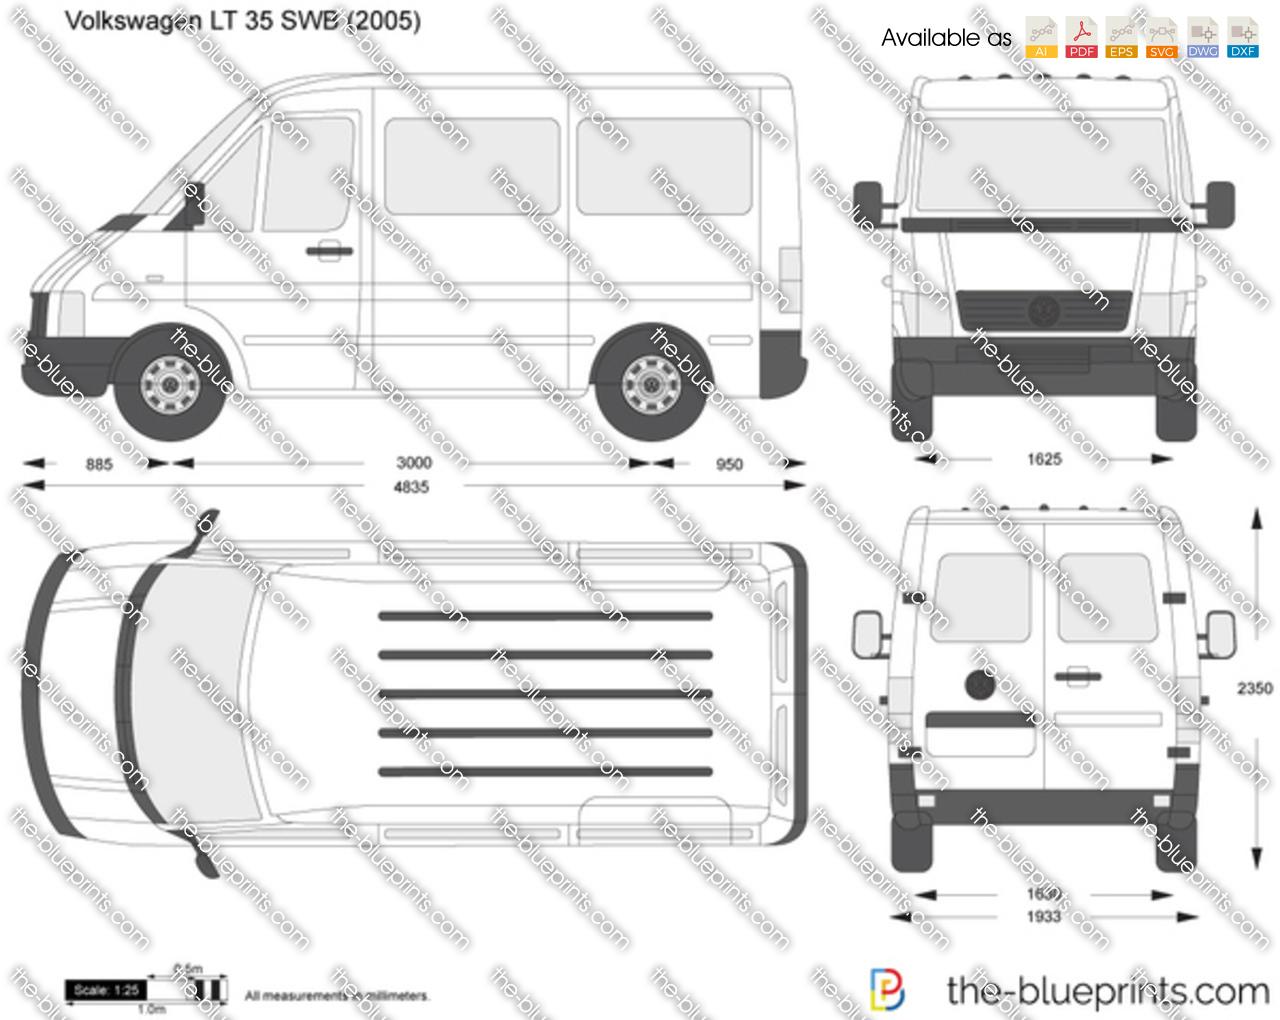 Volkswagen LT 35 SWB